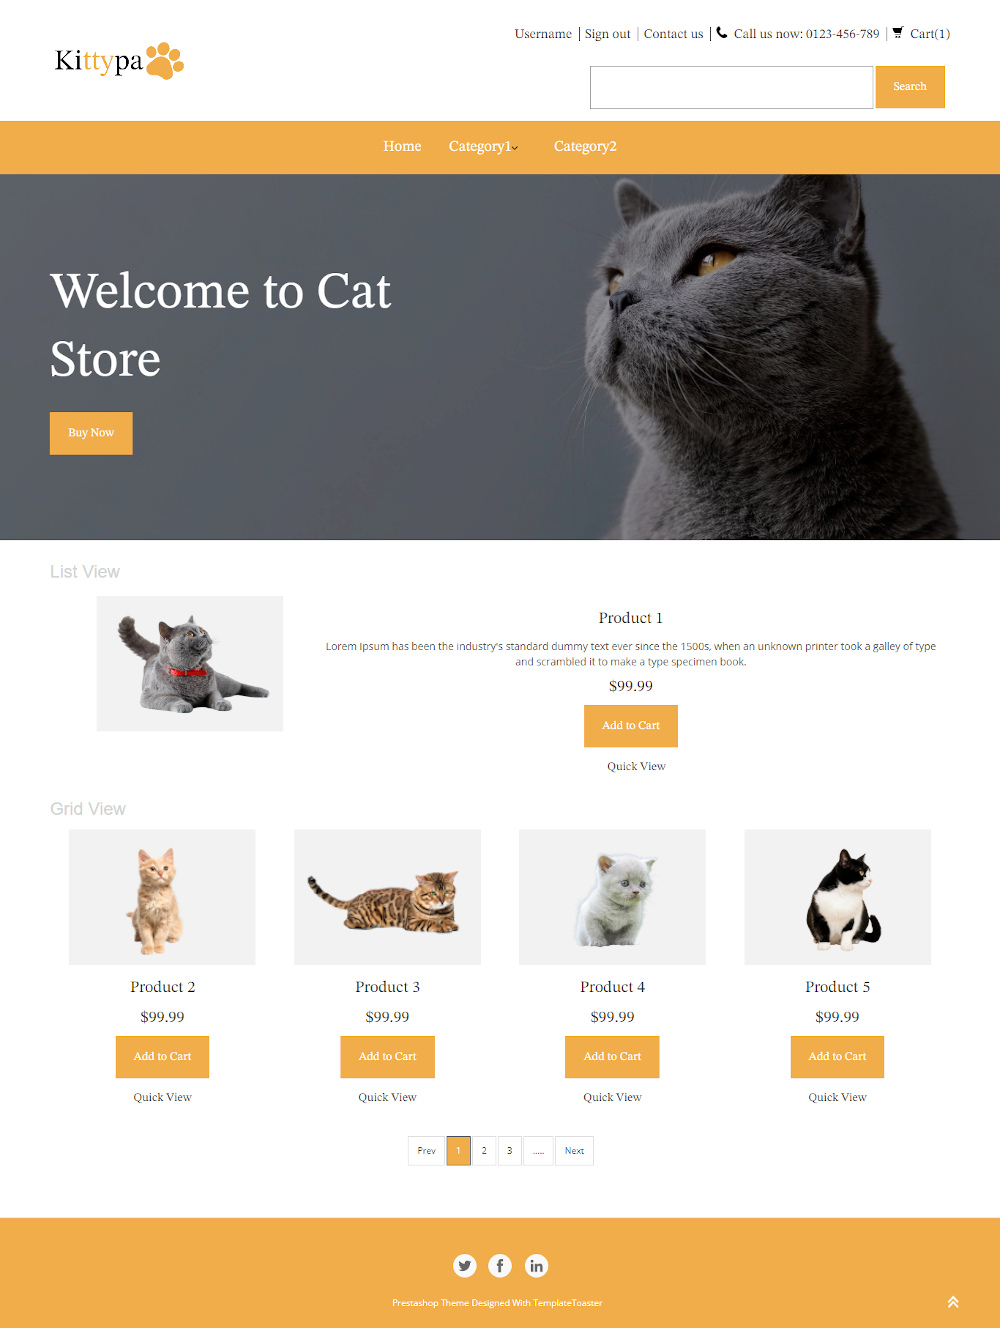 Kittypa - Online Cat Store PrestaShop Theme